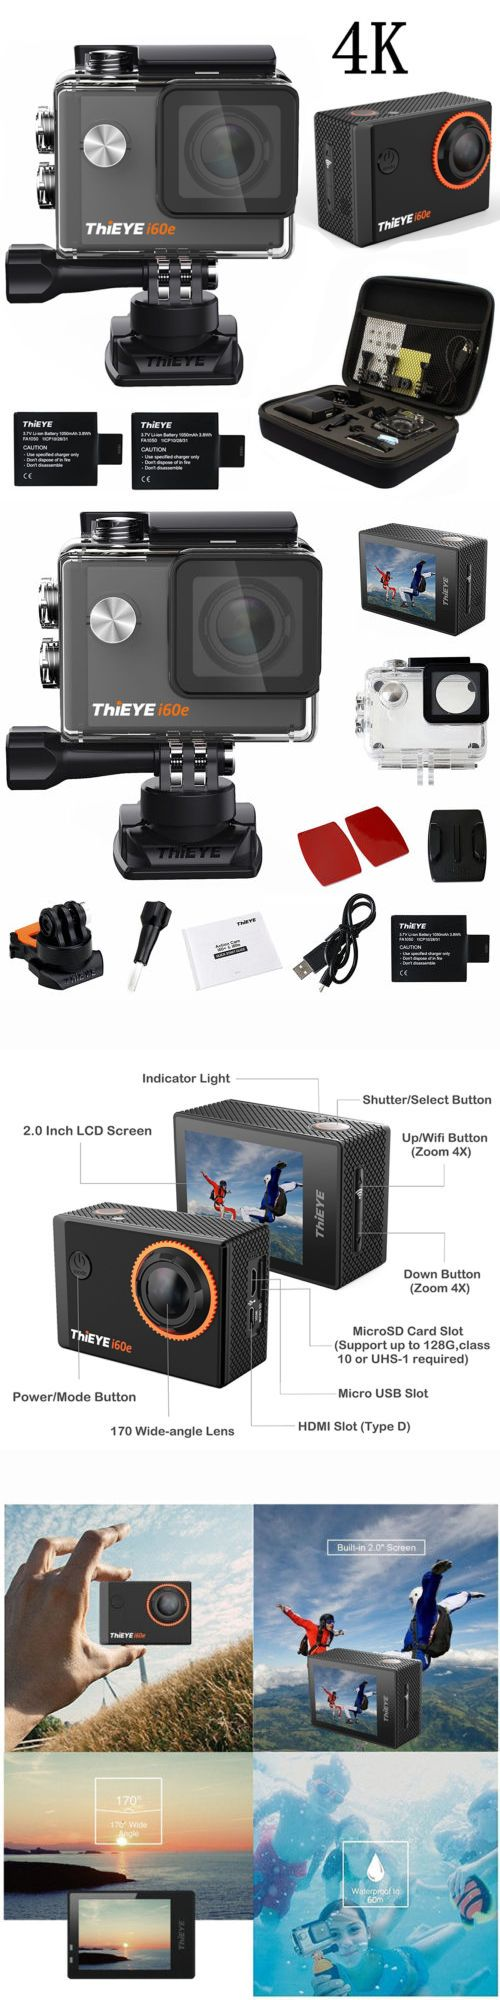 Underwater Cameras 180000: Thieye I60e 4K Action Camera Sport Fhd 60M Waterproof Wifi Helmet Cam Dv + Bag -> BUY IT NOW ONLY: $62.69 on eBay!